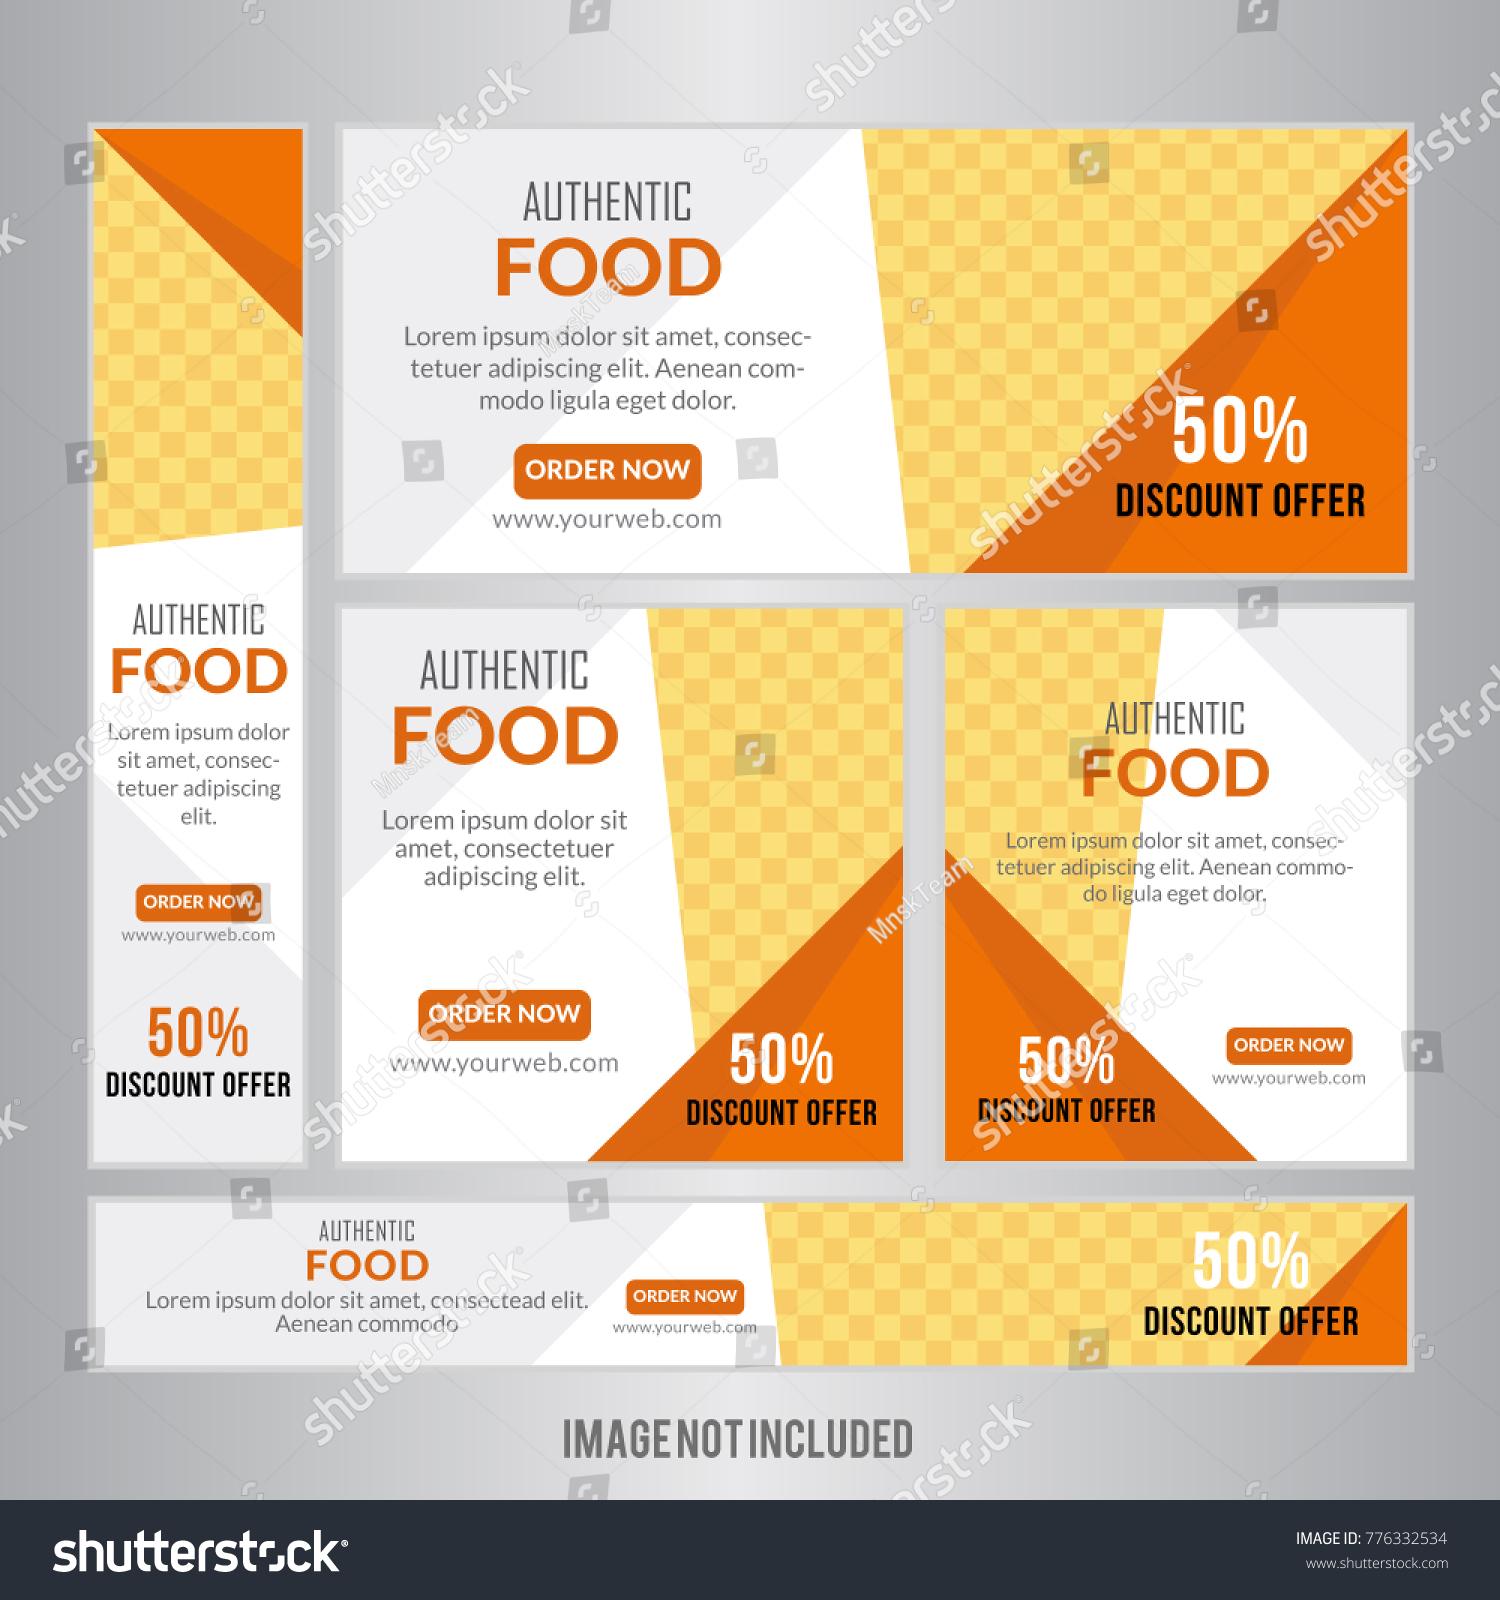 Vector De Stock Libre De Regalias Sobre Food Restaurant Yellow Color Vector Web776332534